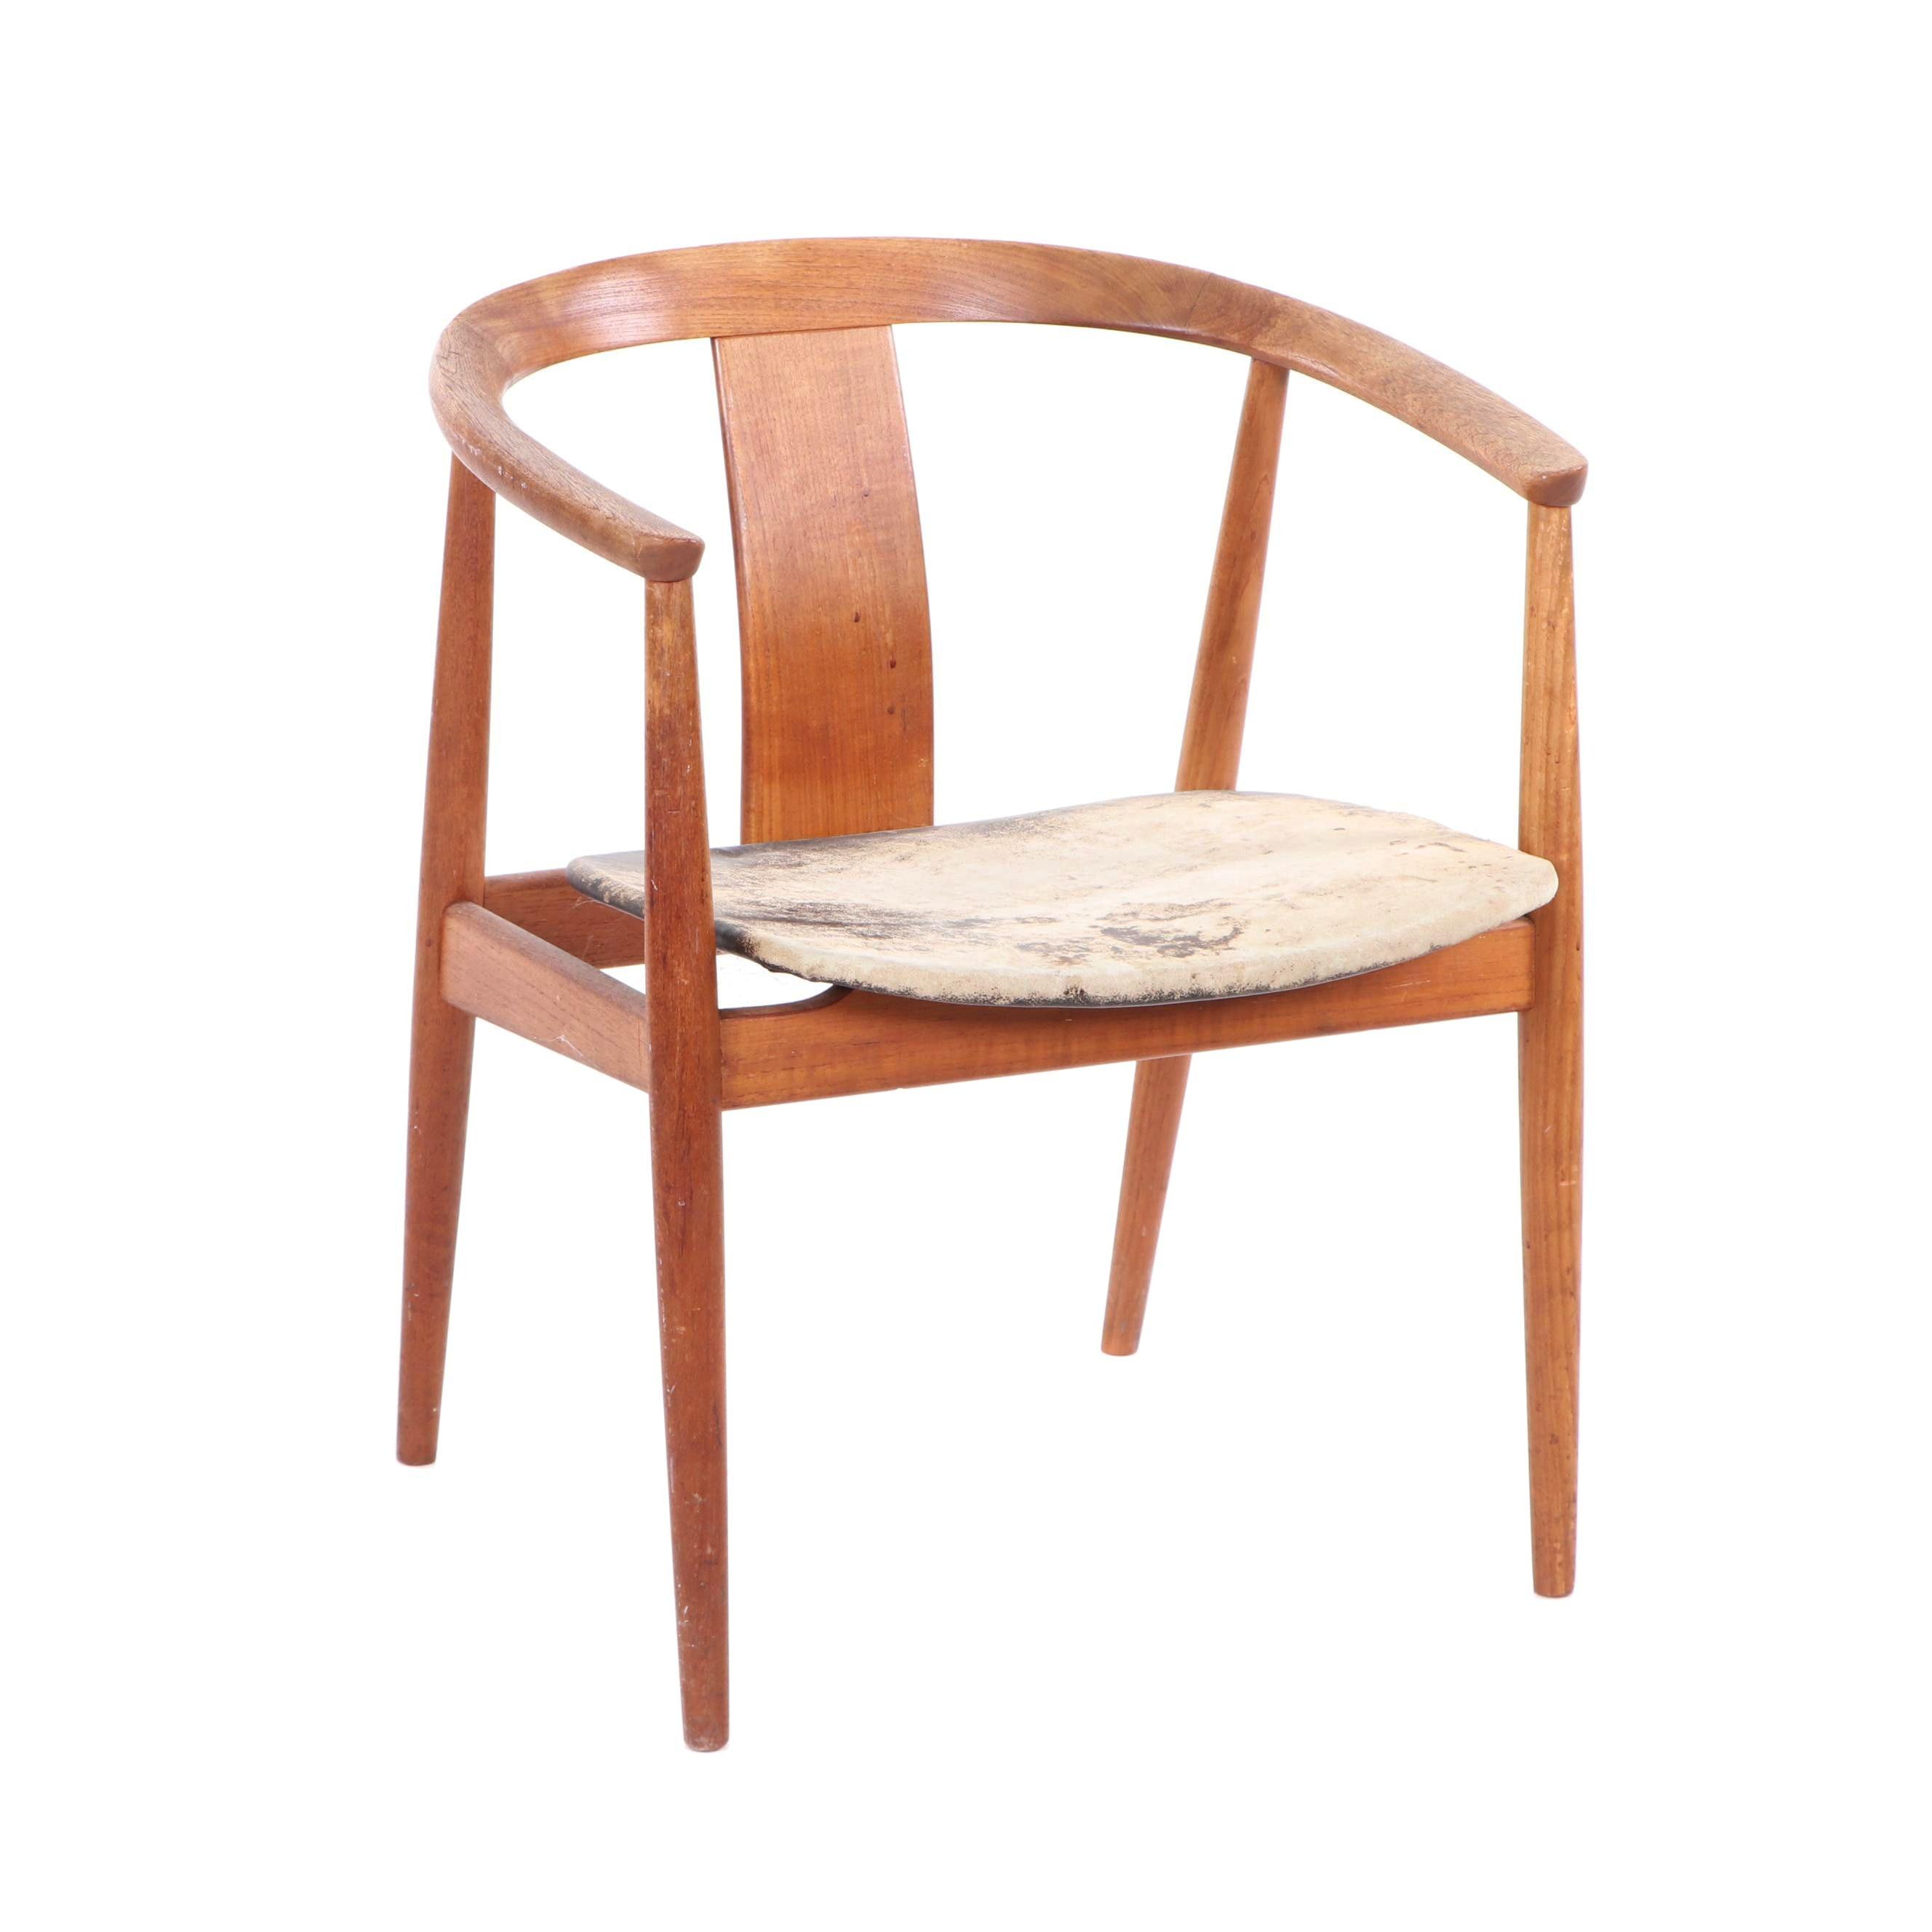 Danish Modern Wishbone Style Teak Armchair, Mid 20th Century